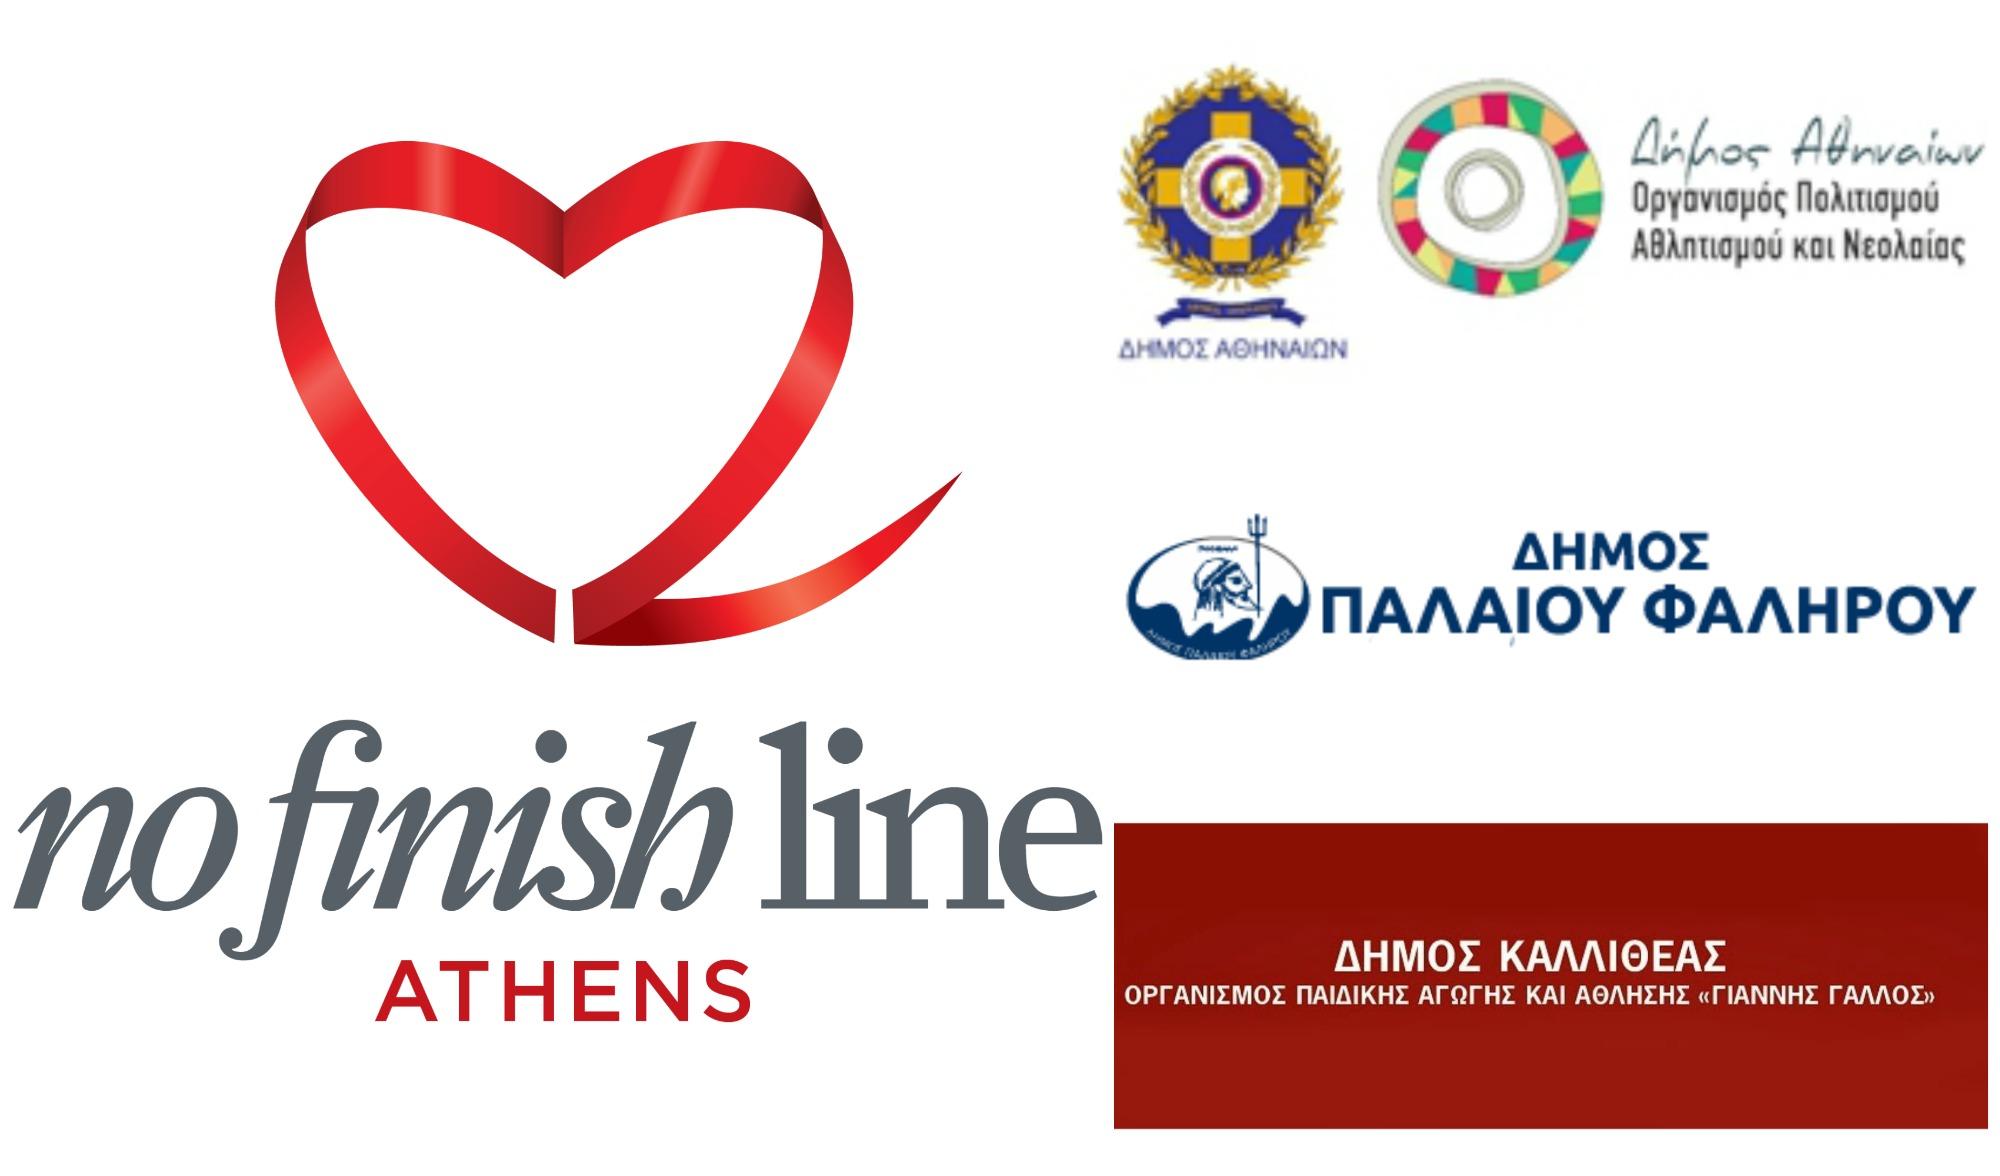 Oι Δήμοι Αθηναίων, Παλαιού Φαλήρου και Καλλιθέας υποστηρίζουν  το No Finish Line!